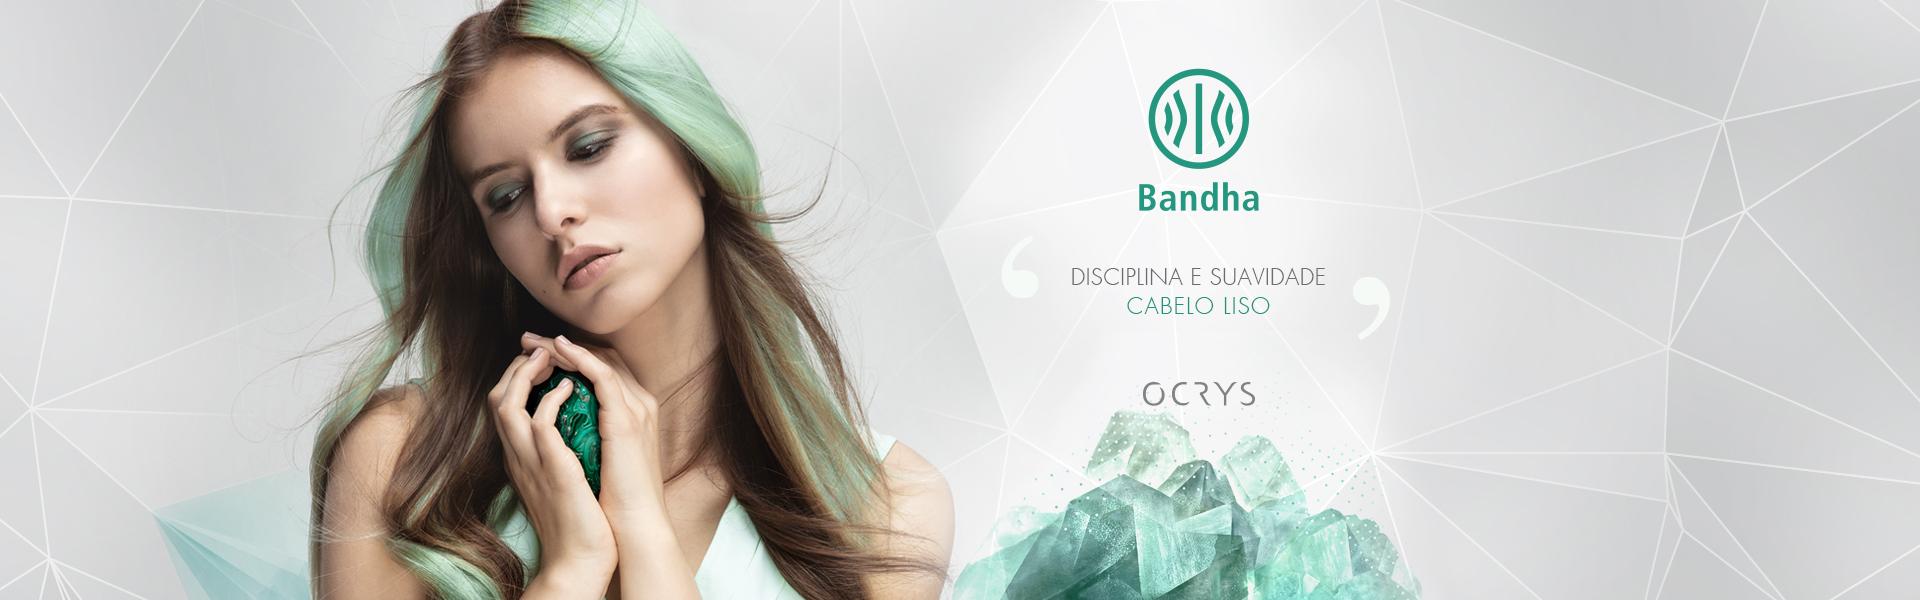 banner_centrali_BANDHA_ES